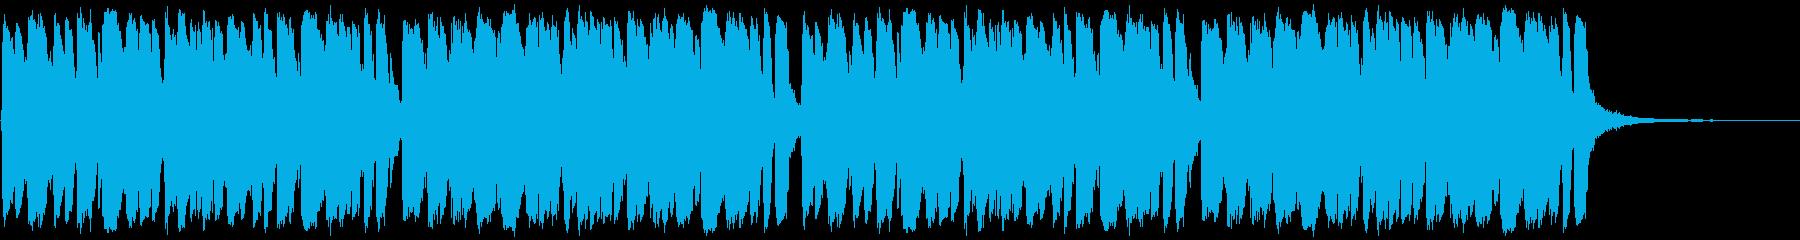 CM ホンキートンクピアノのカントリー2の再生済みの波形